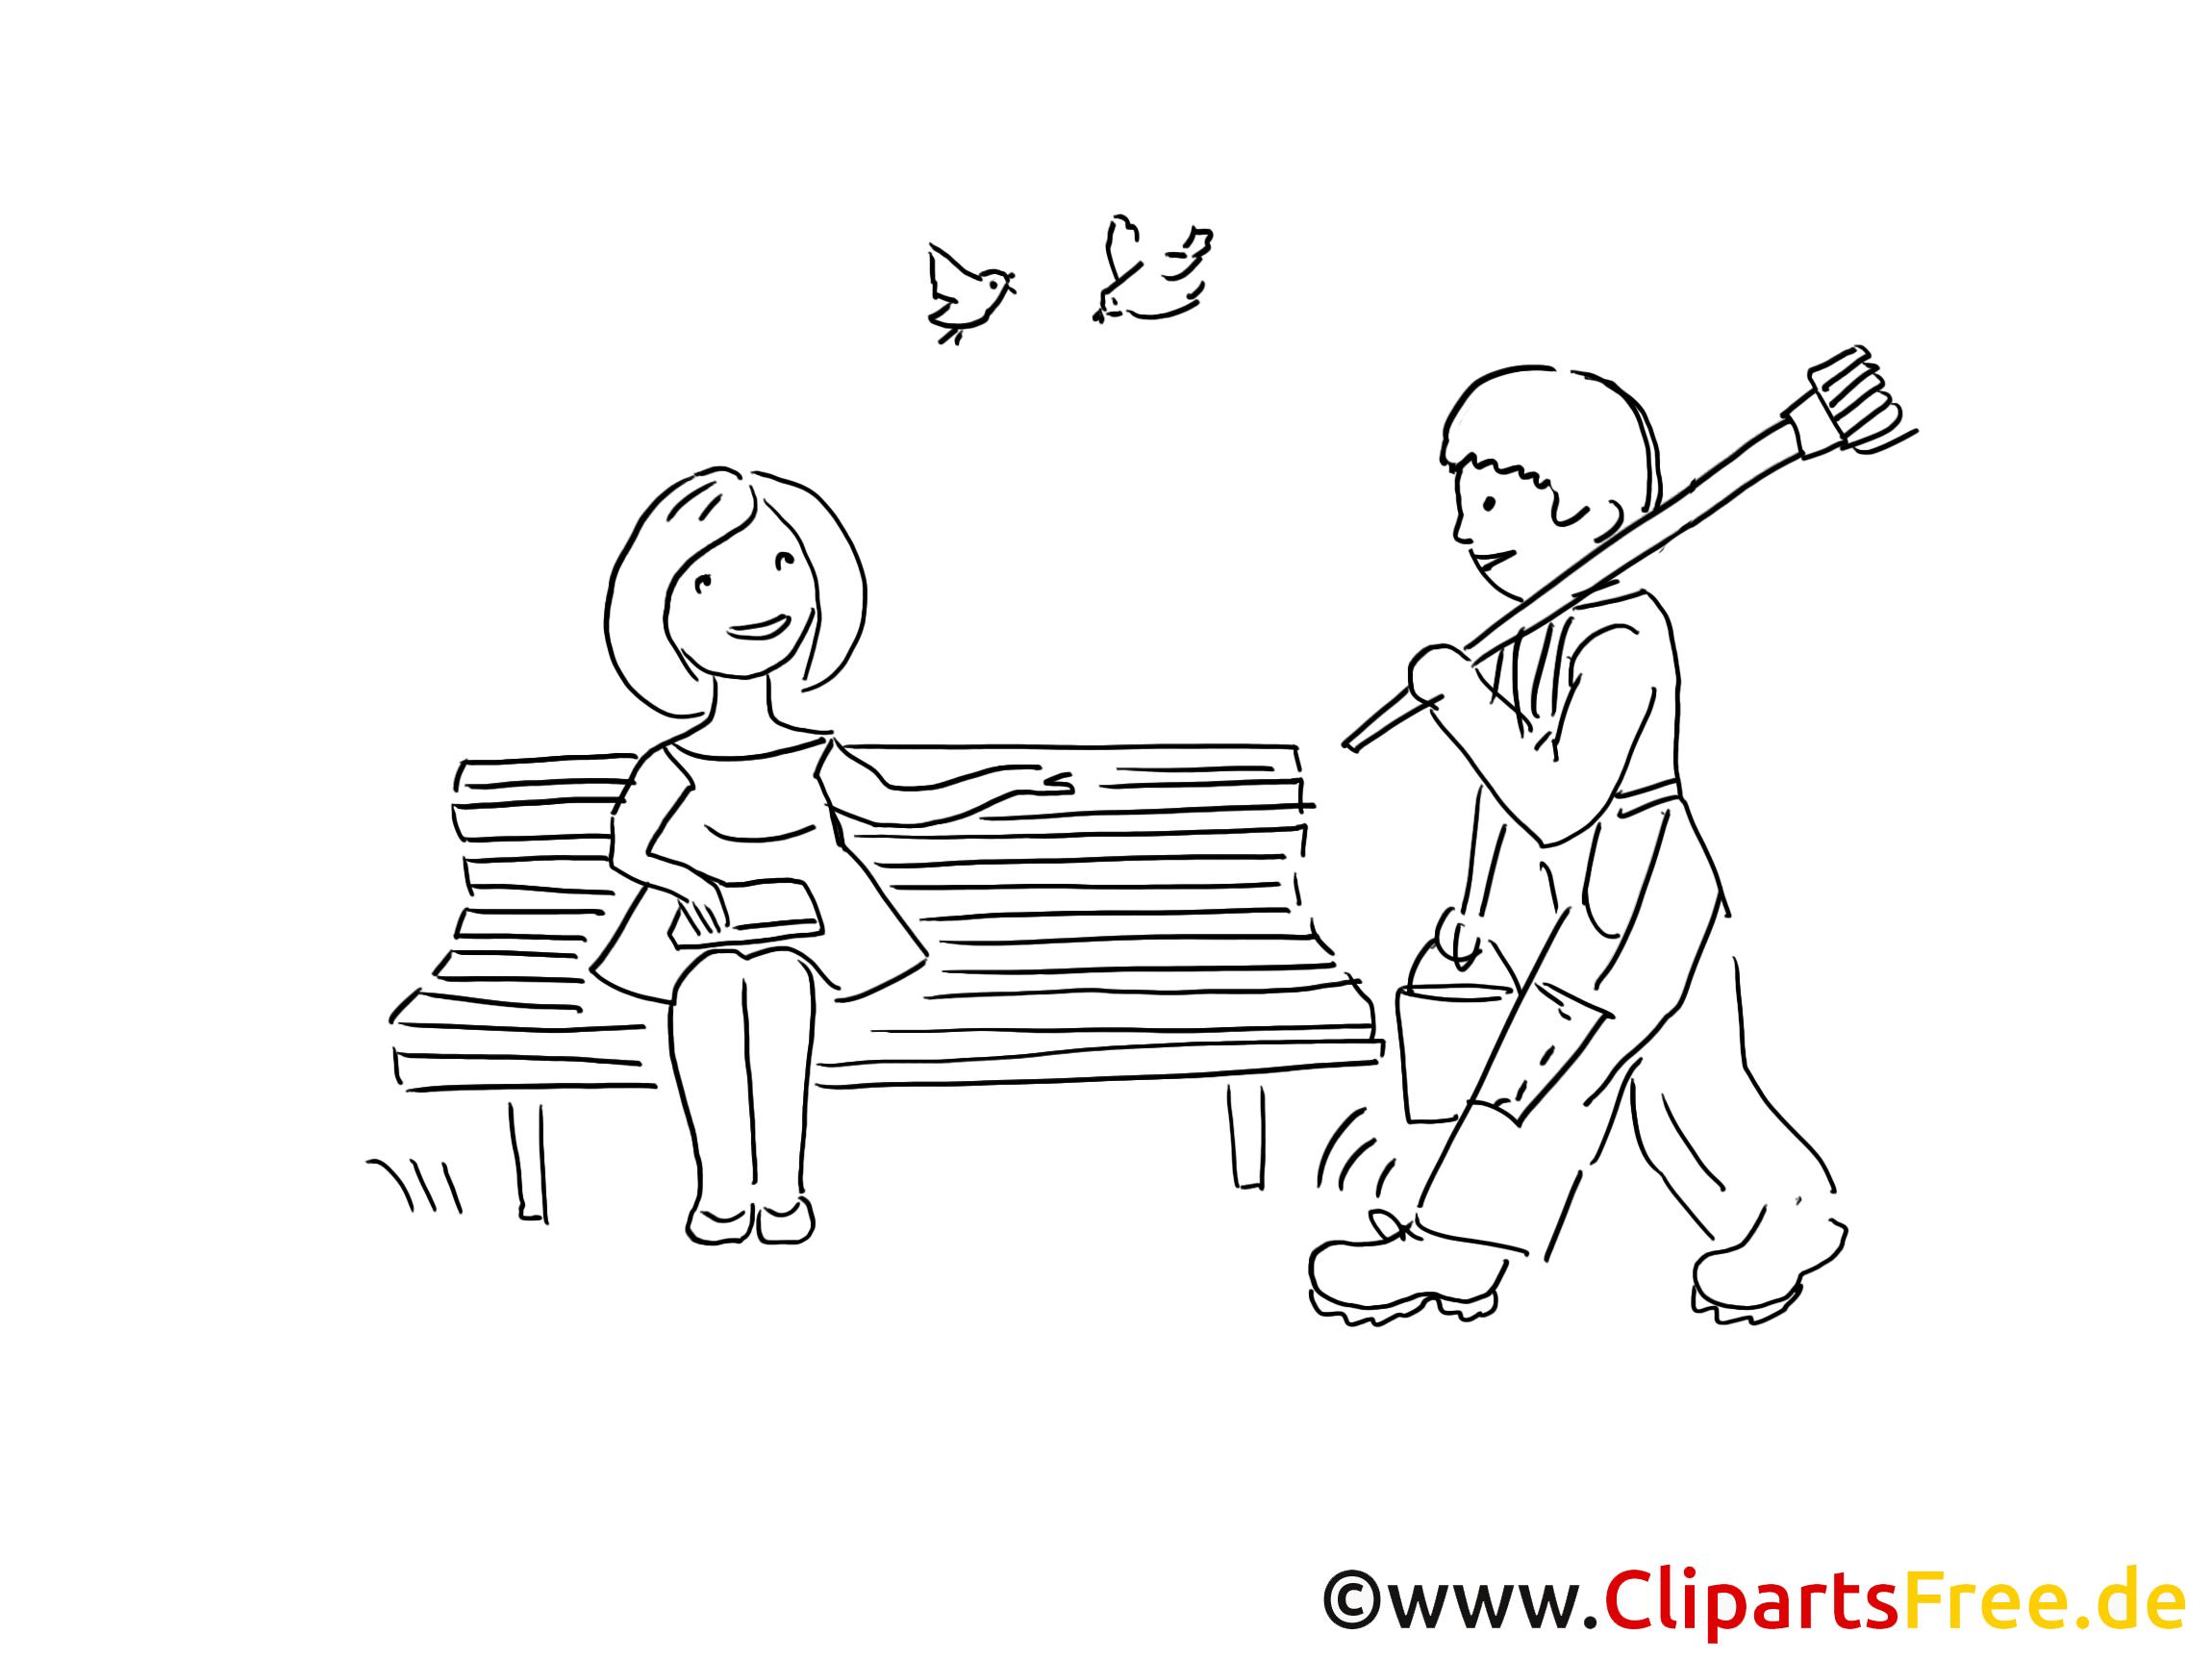 Freunde treffen ausmalbild [PUNIQRANDLINE-(au-dating-names.txt) 44